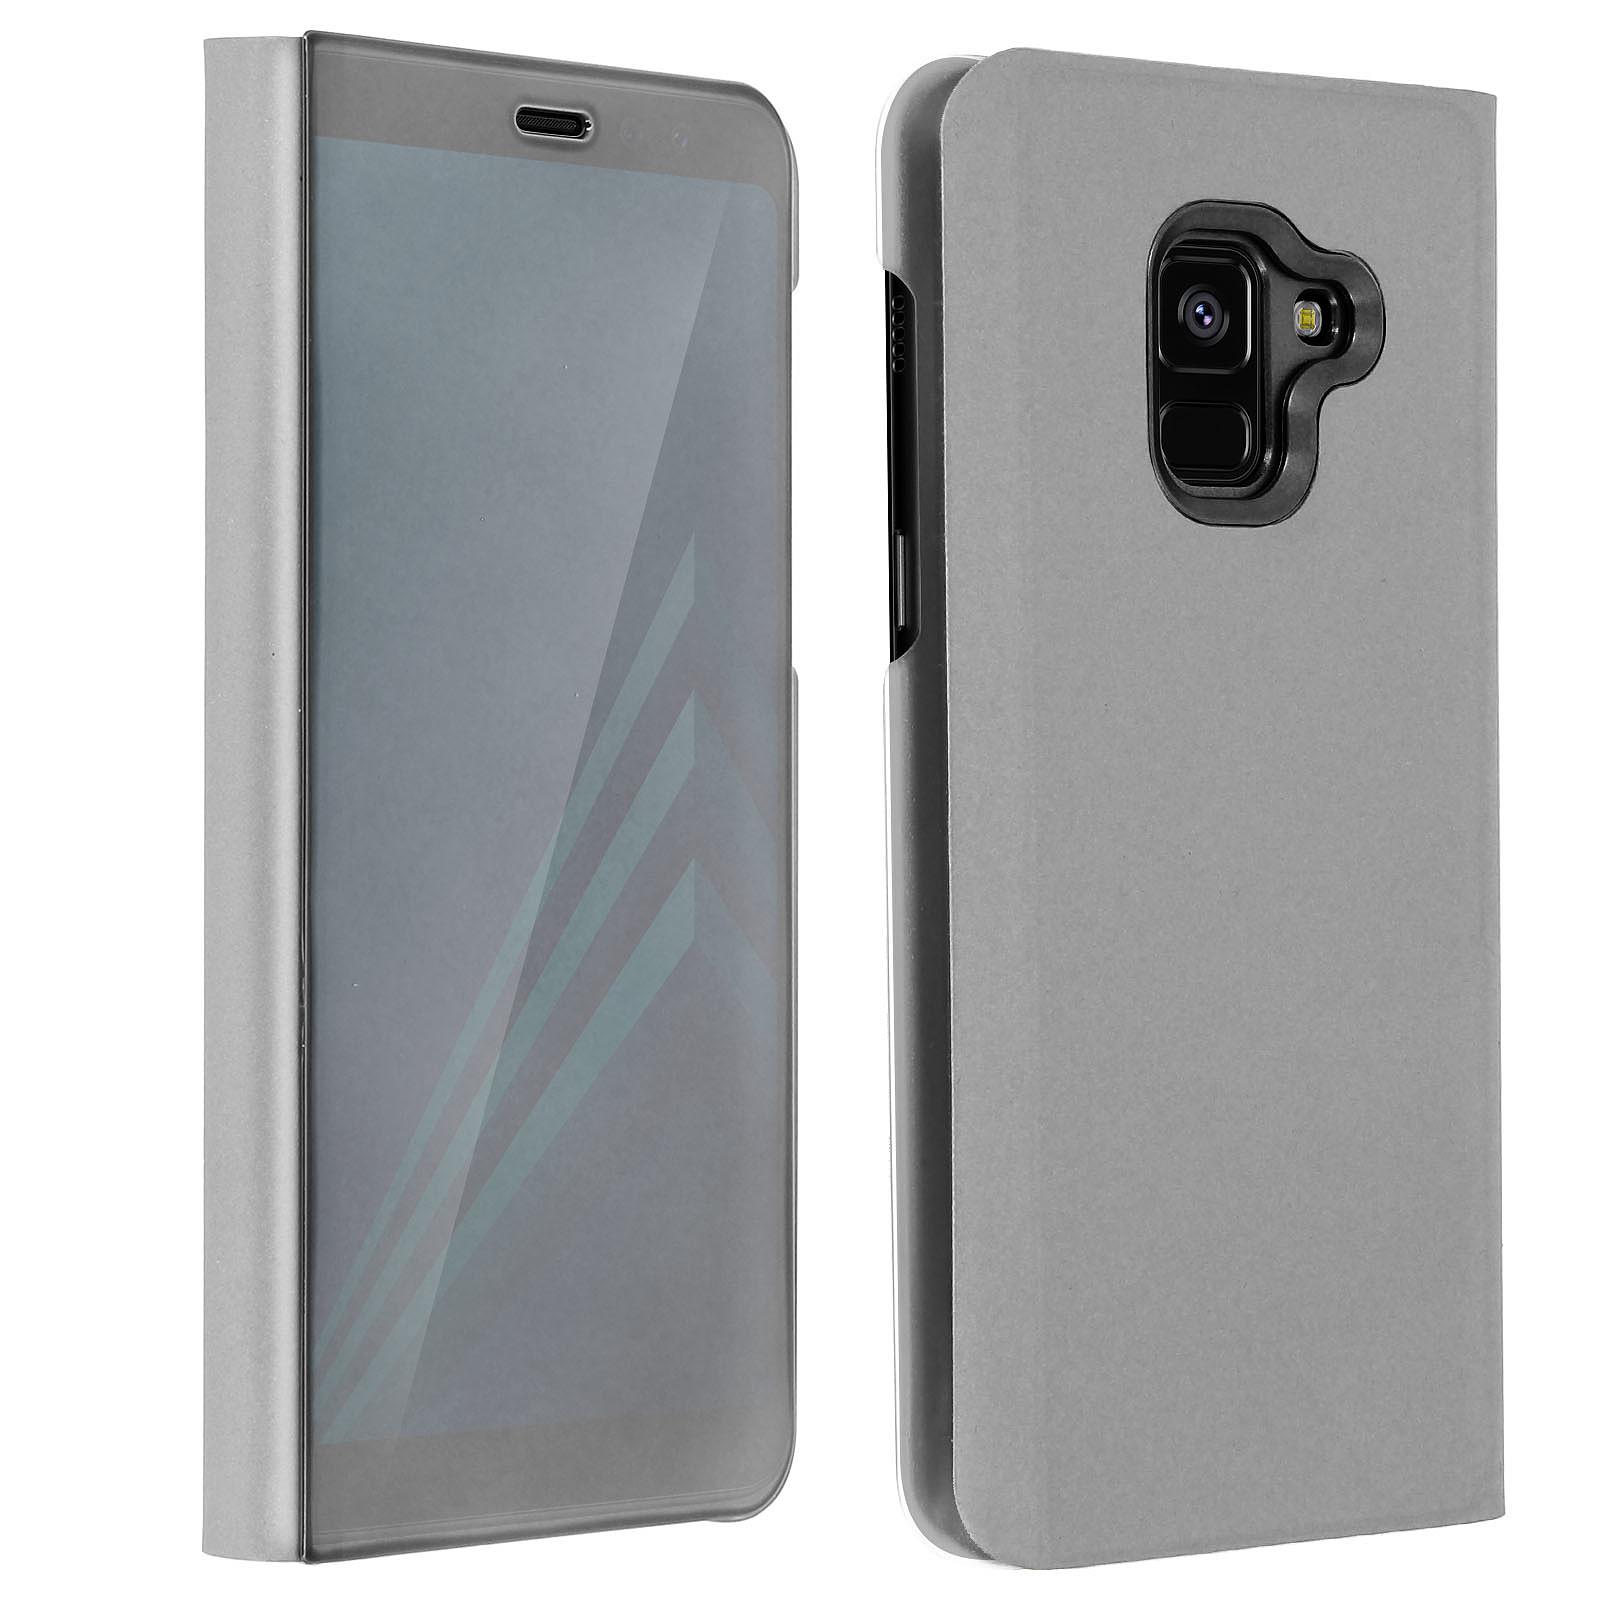 Avizar Etui folio Argent pour Samsung Galaxy A8